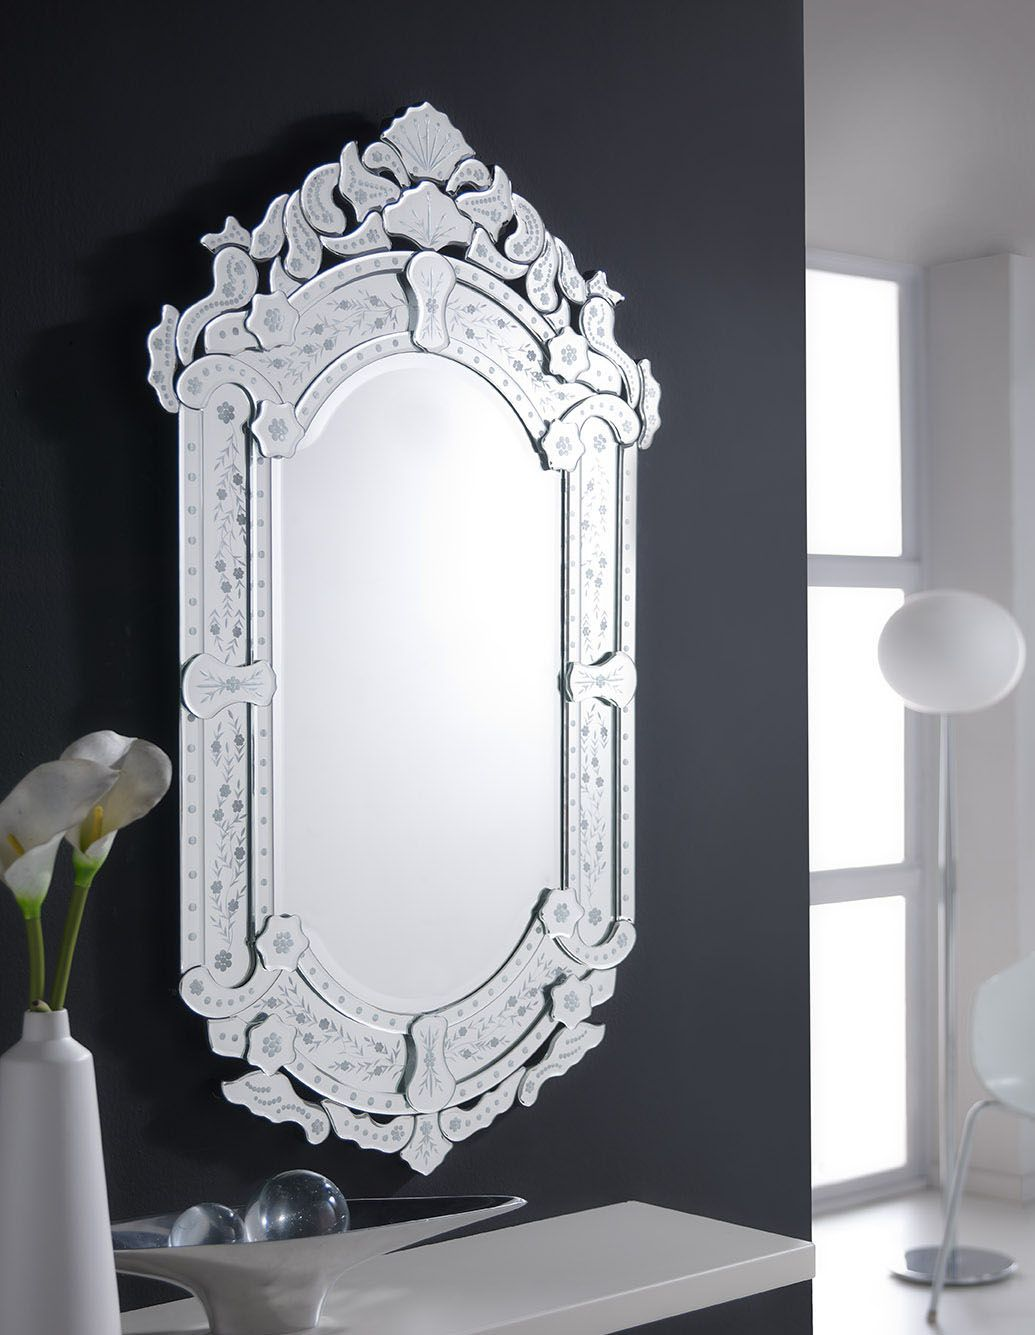 Espejos venecianos modernos gran cat logo online www for Espejos decorativos baratos online